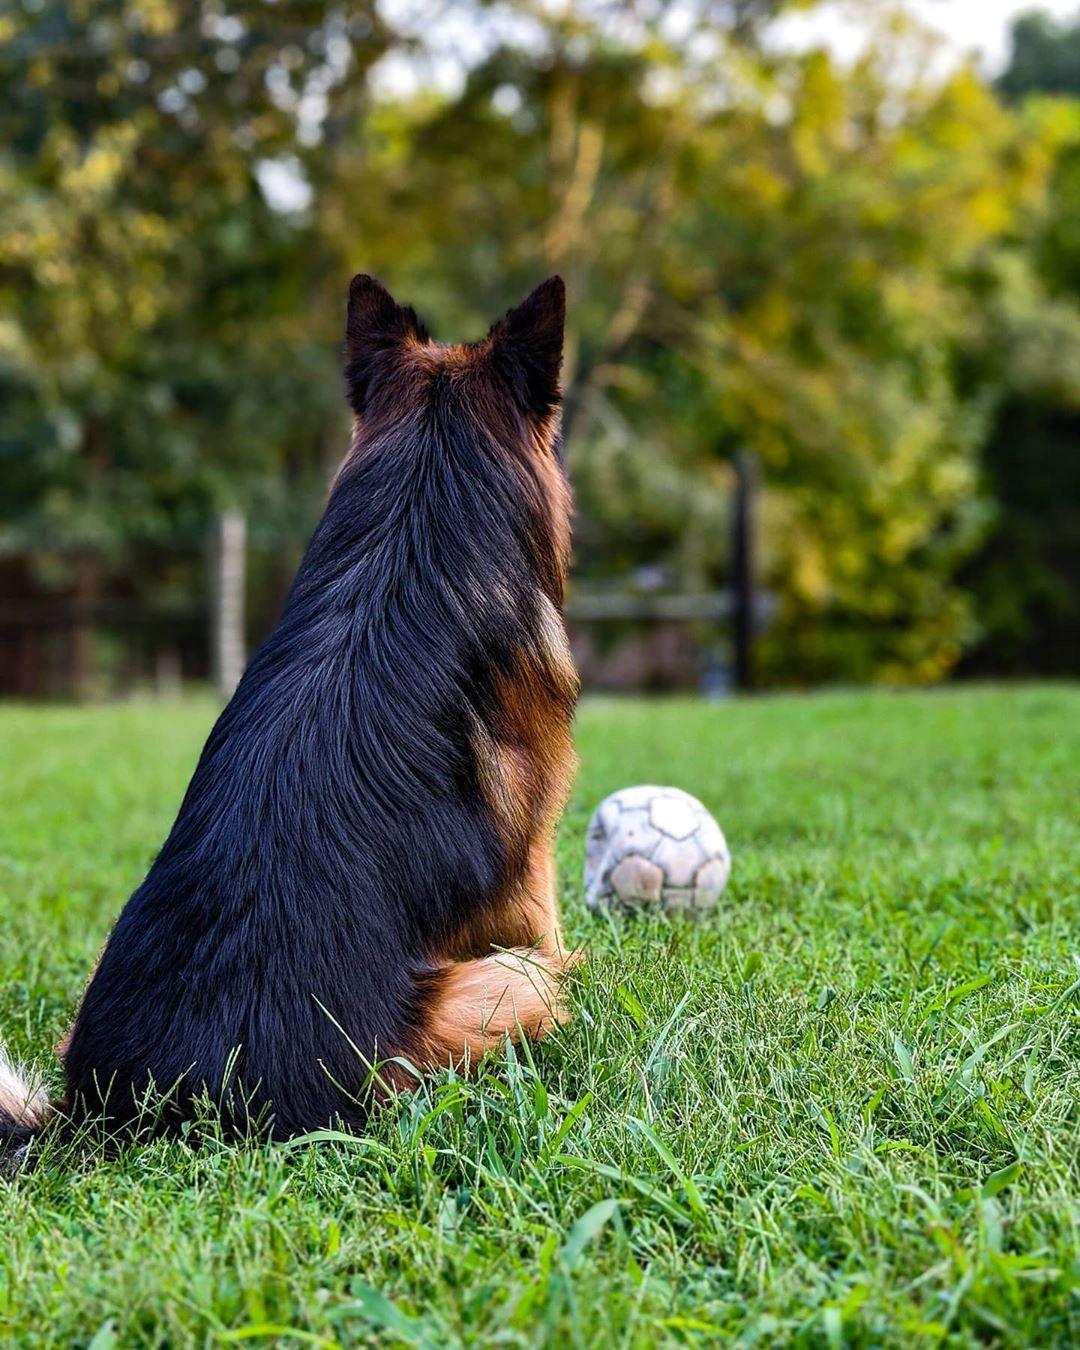 Enjoying the fall afternoon 🍃🐾 _________________________________________ #fall #playtime #dogtime #sunset #fallvibes #petstagram #petsofinstagram #dogstagram #doglovers #dogsofinsta #doglifeisgood #dogsofinstagram #dogmom #gsdofinstagram #gsdlife #gsdlovers #gsdstagram #gsdofig #gsd #gsddaily #germanshepherdsofinstagram #germanshepherdofig #germanshepherddog #germanshepherd #germanshepherdlovers #longhairedgsd #longhairedgermanshepherd #germanshepherdcentral #germanshepherds #gsdnation